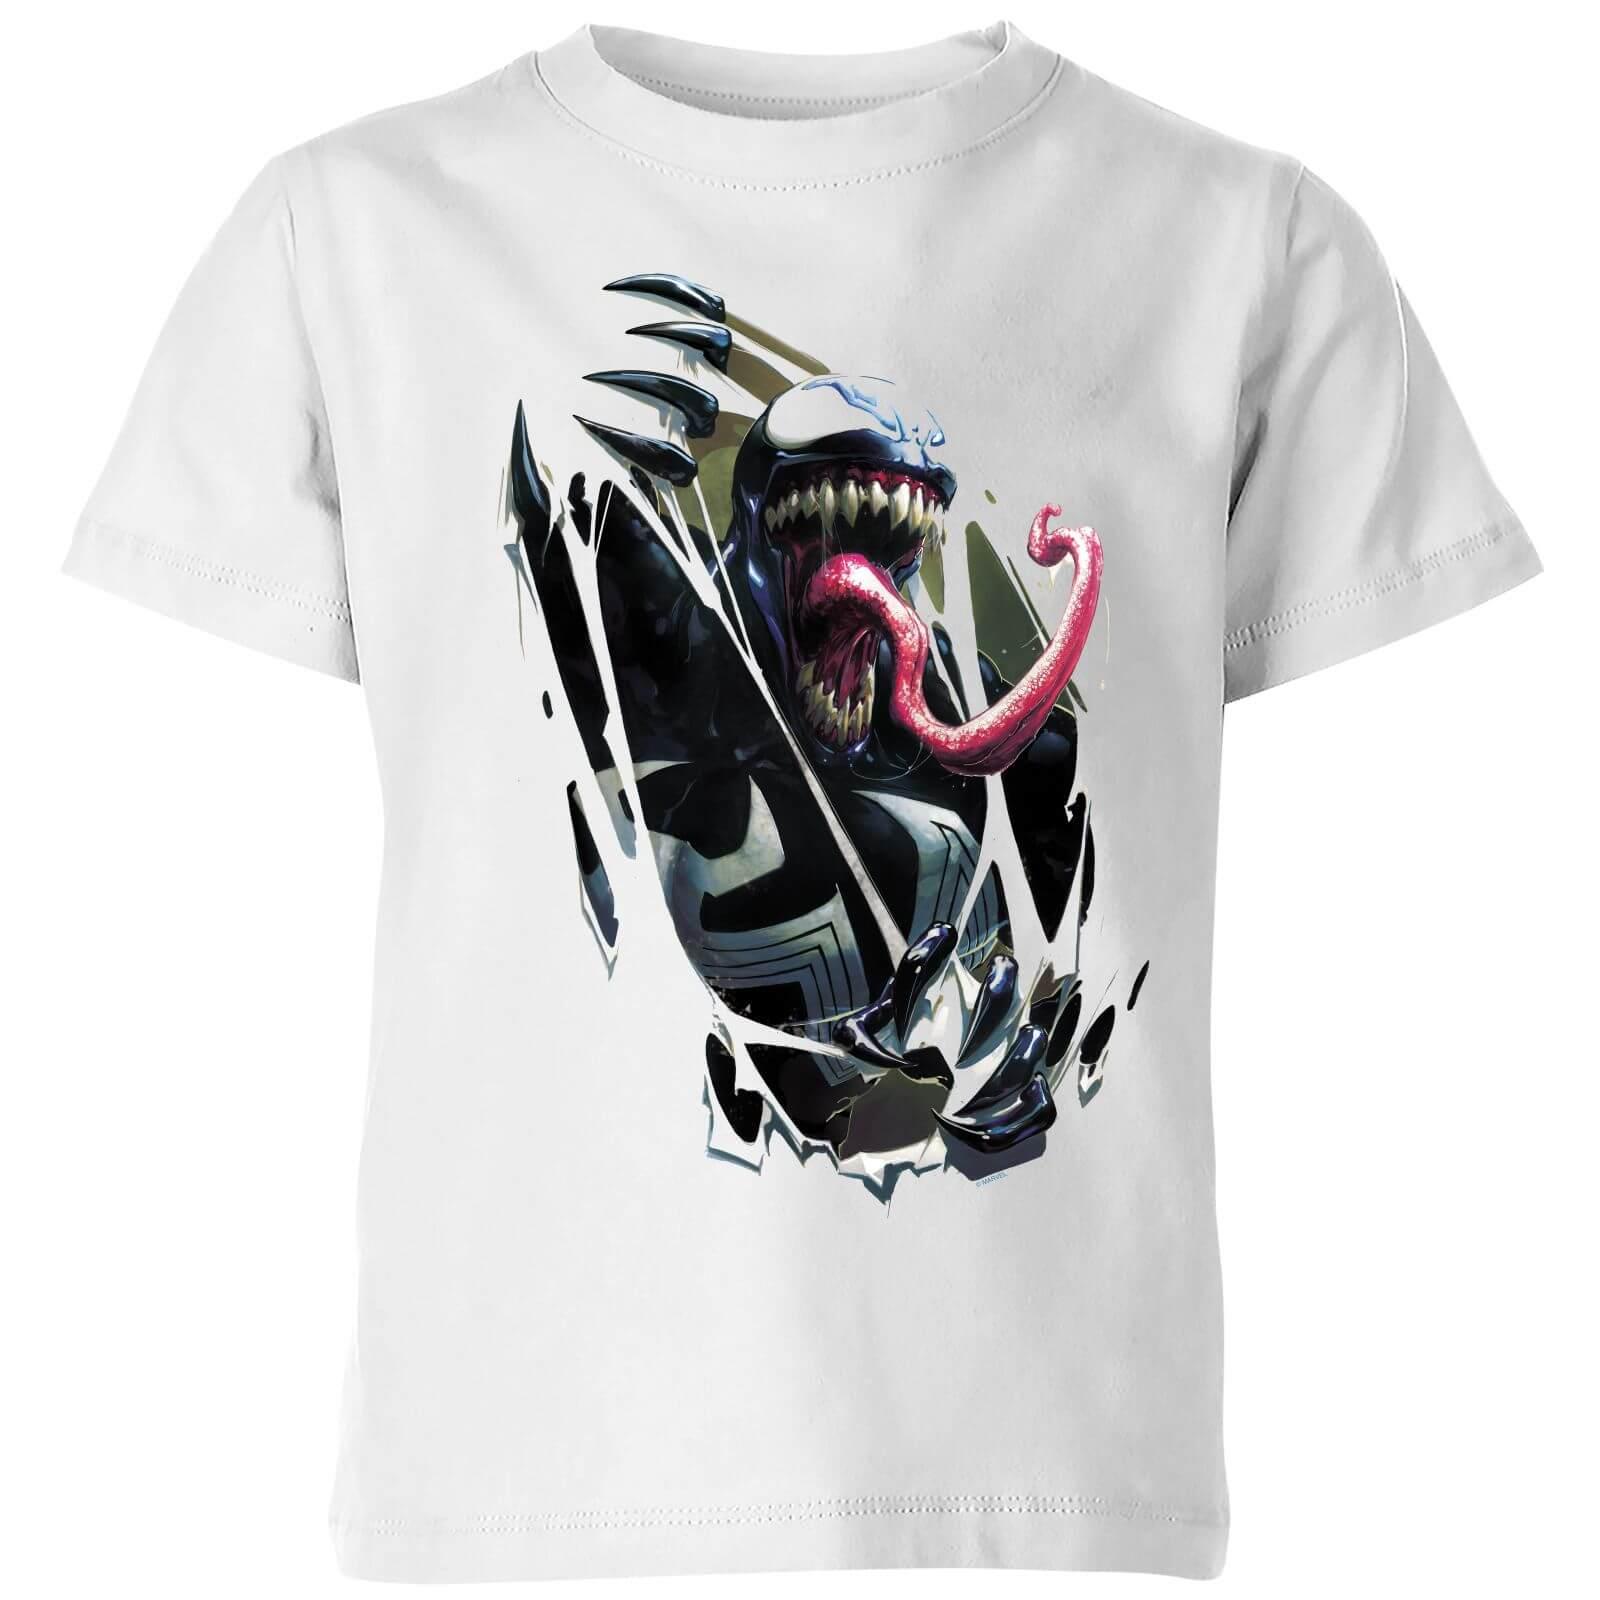 Shazam 5//6 SAY MY NAME Licensed T-Shirt KIDS Sizes 4 7